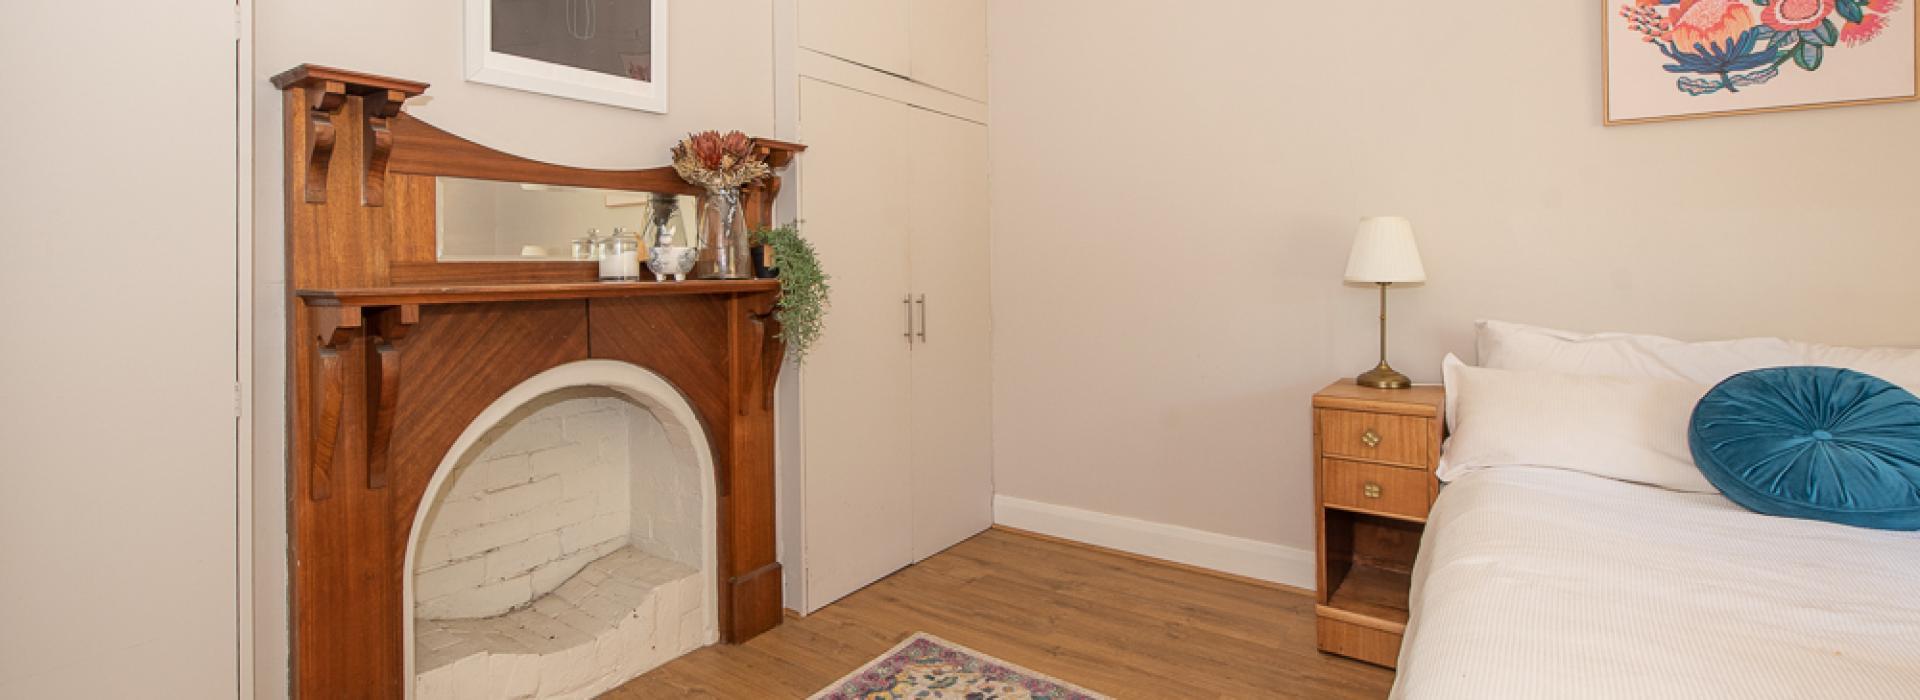 Flanagan Residential   Rae Smith   For Sale   South Launceston